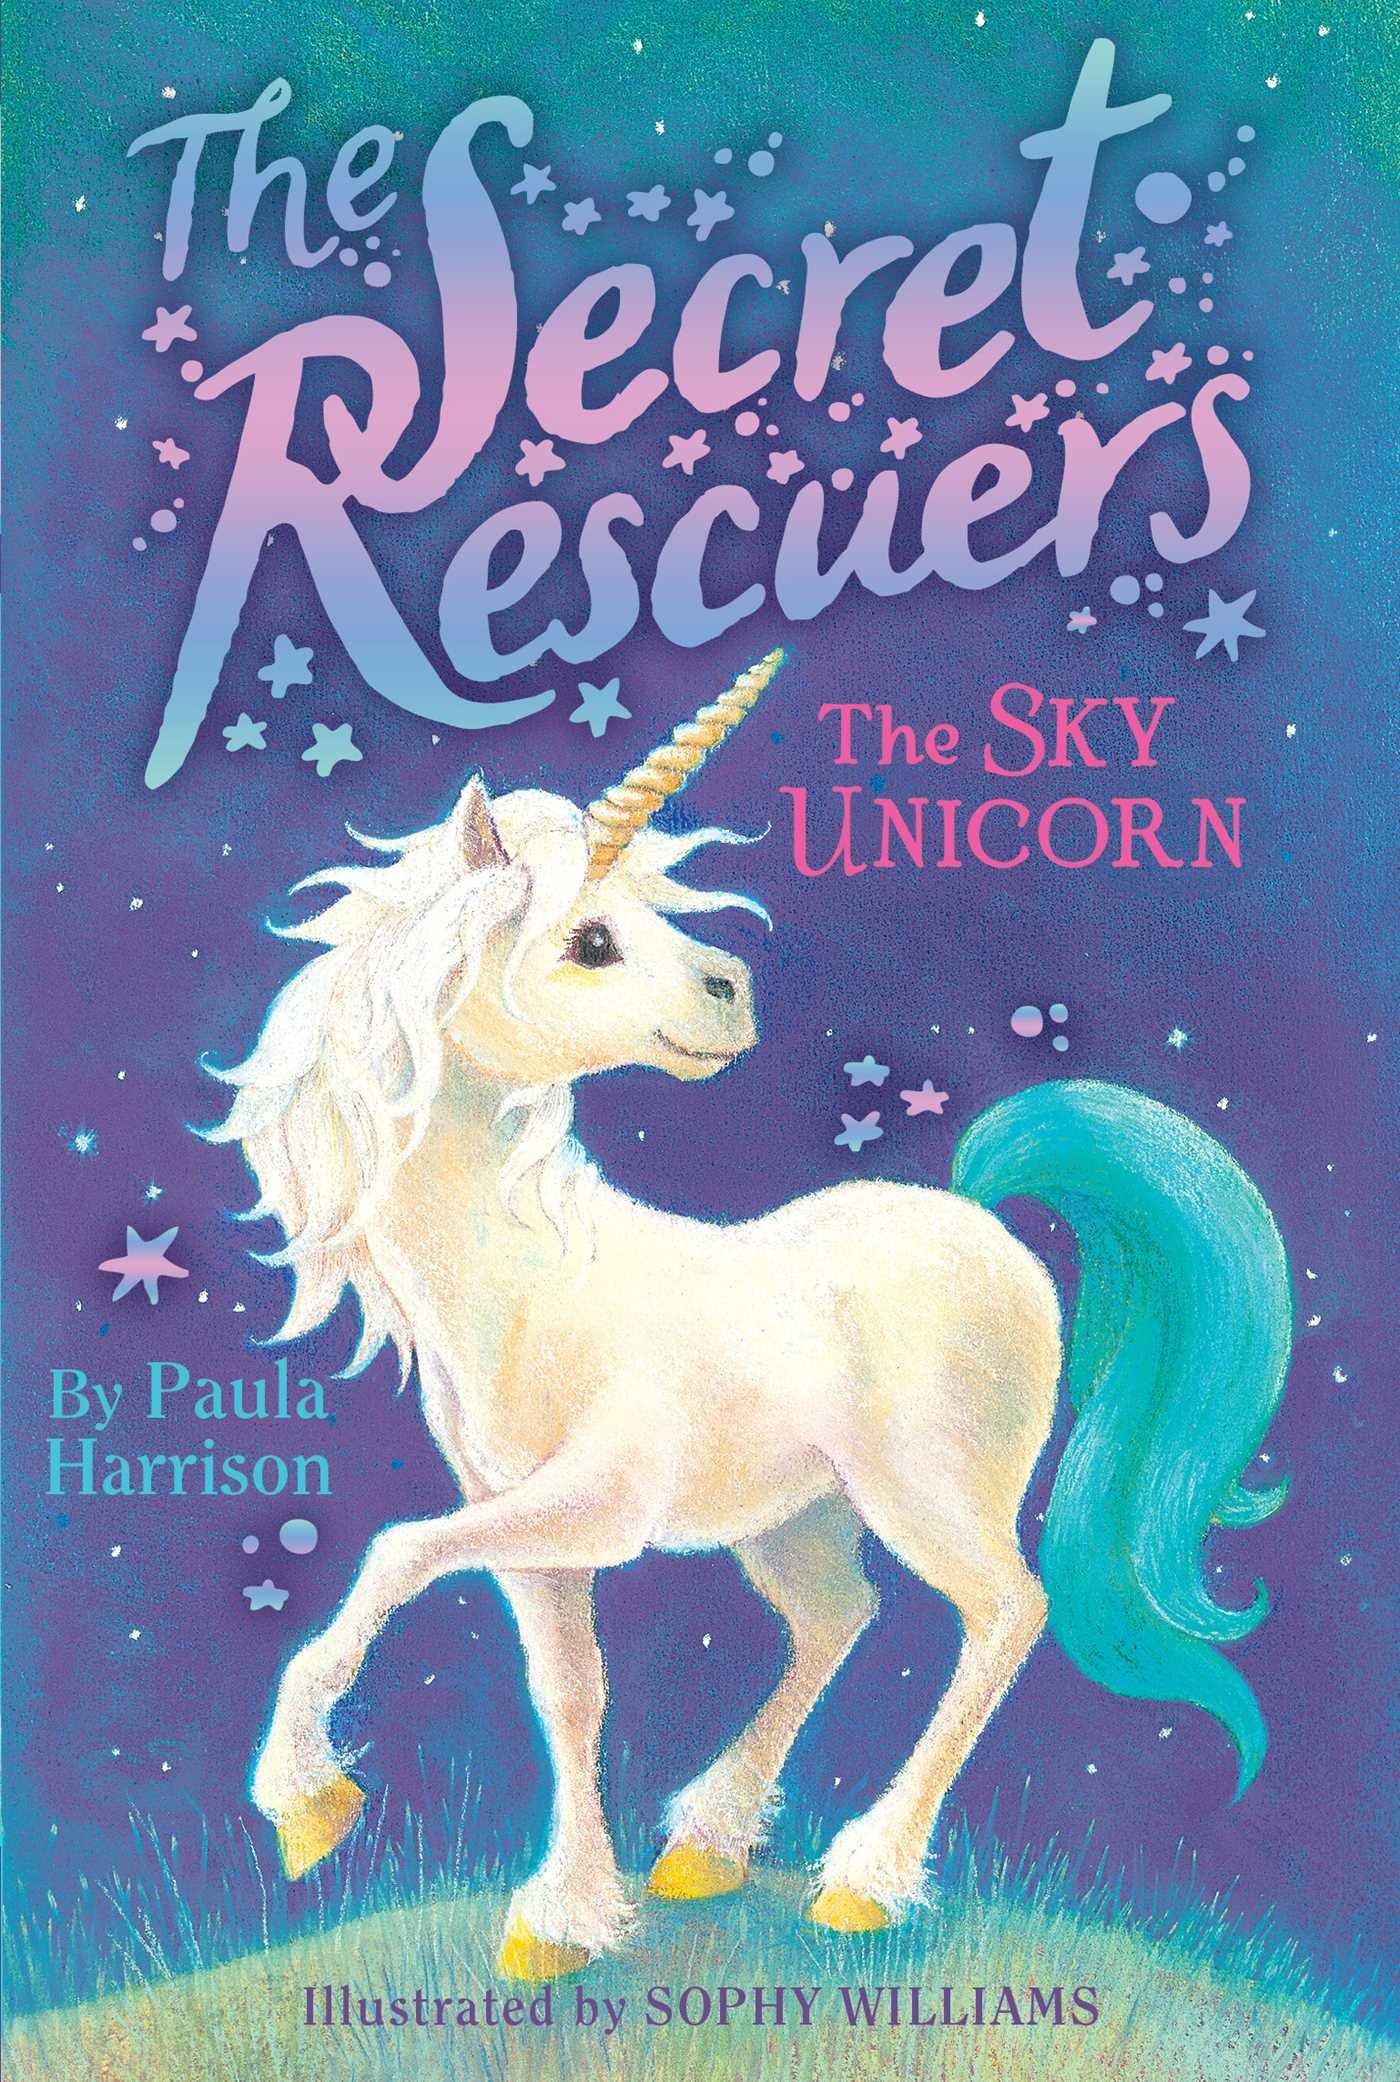 Read Online The Sky Unicorn (The Secret Rescuers) PDF